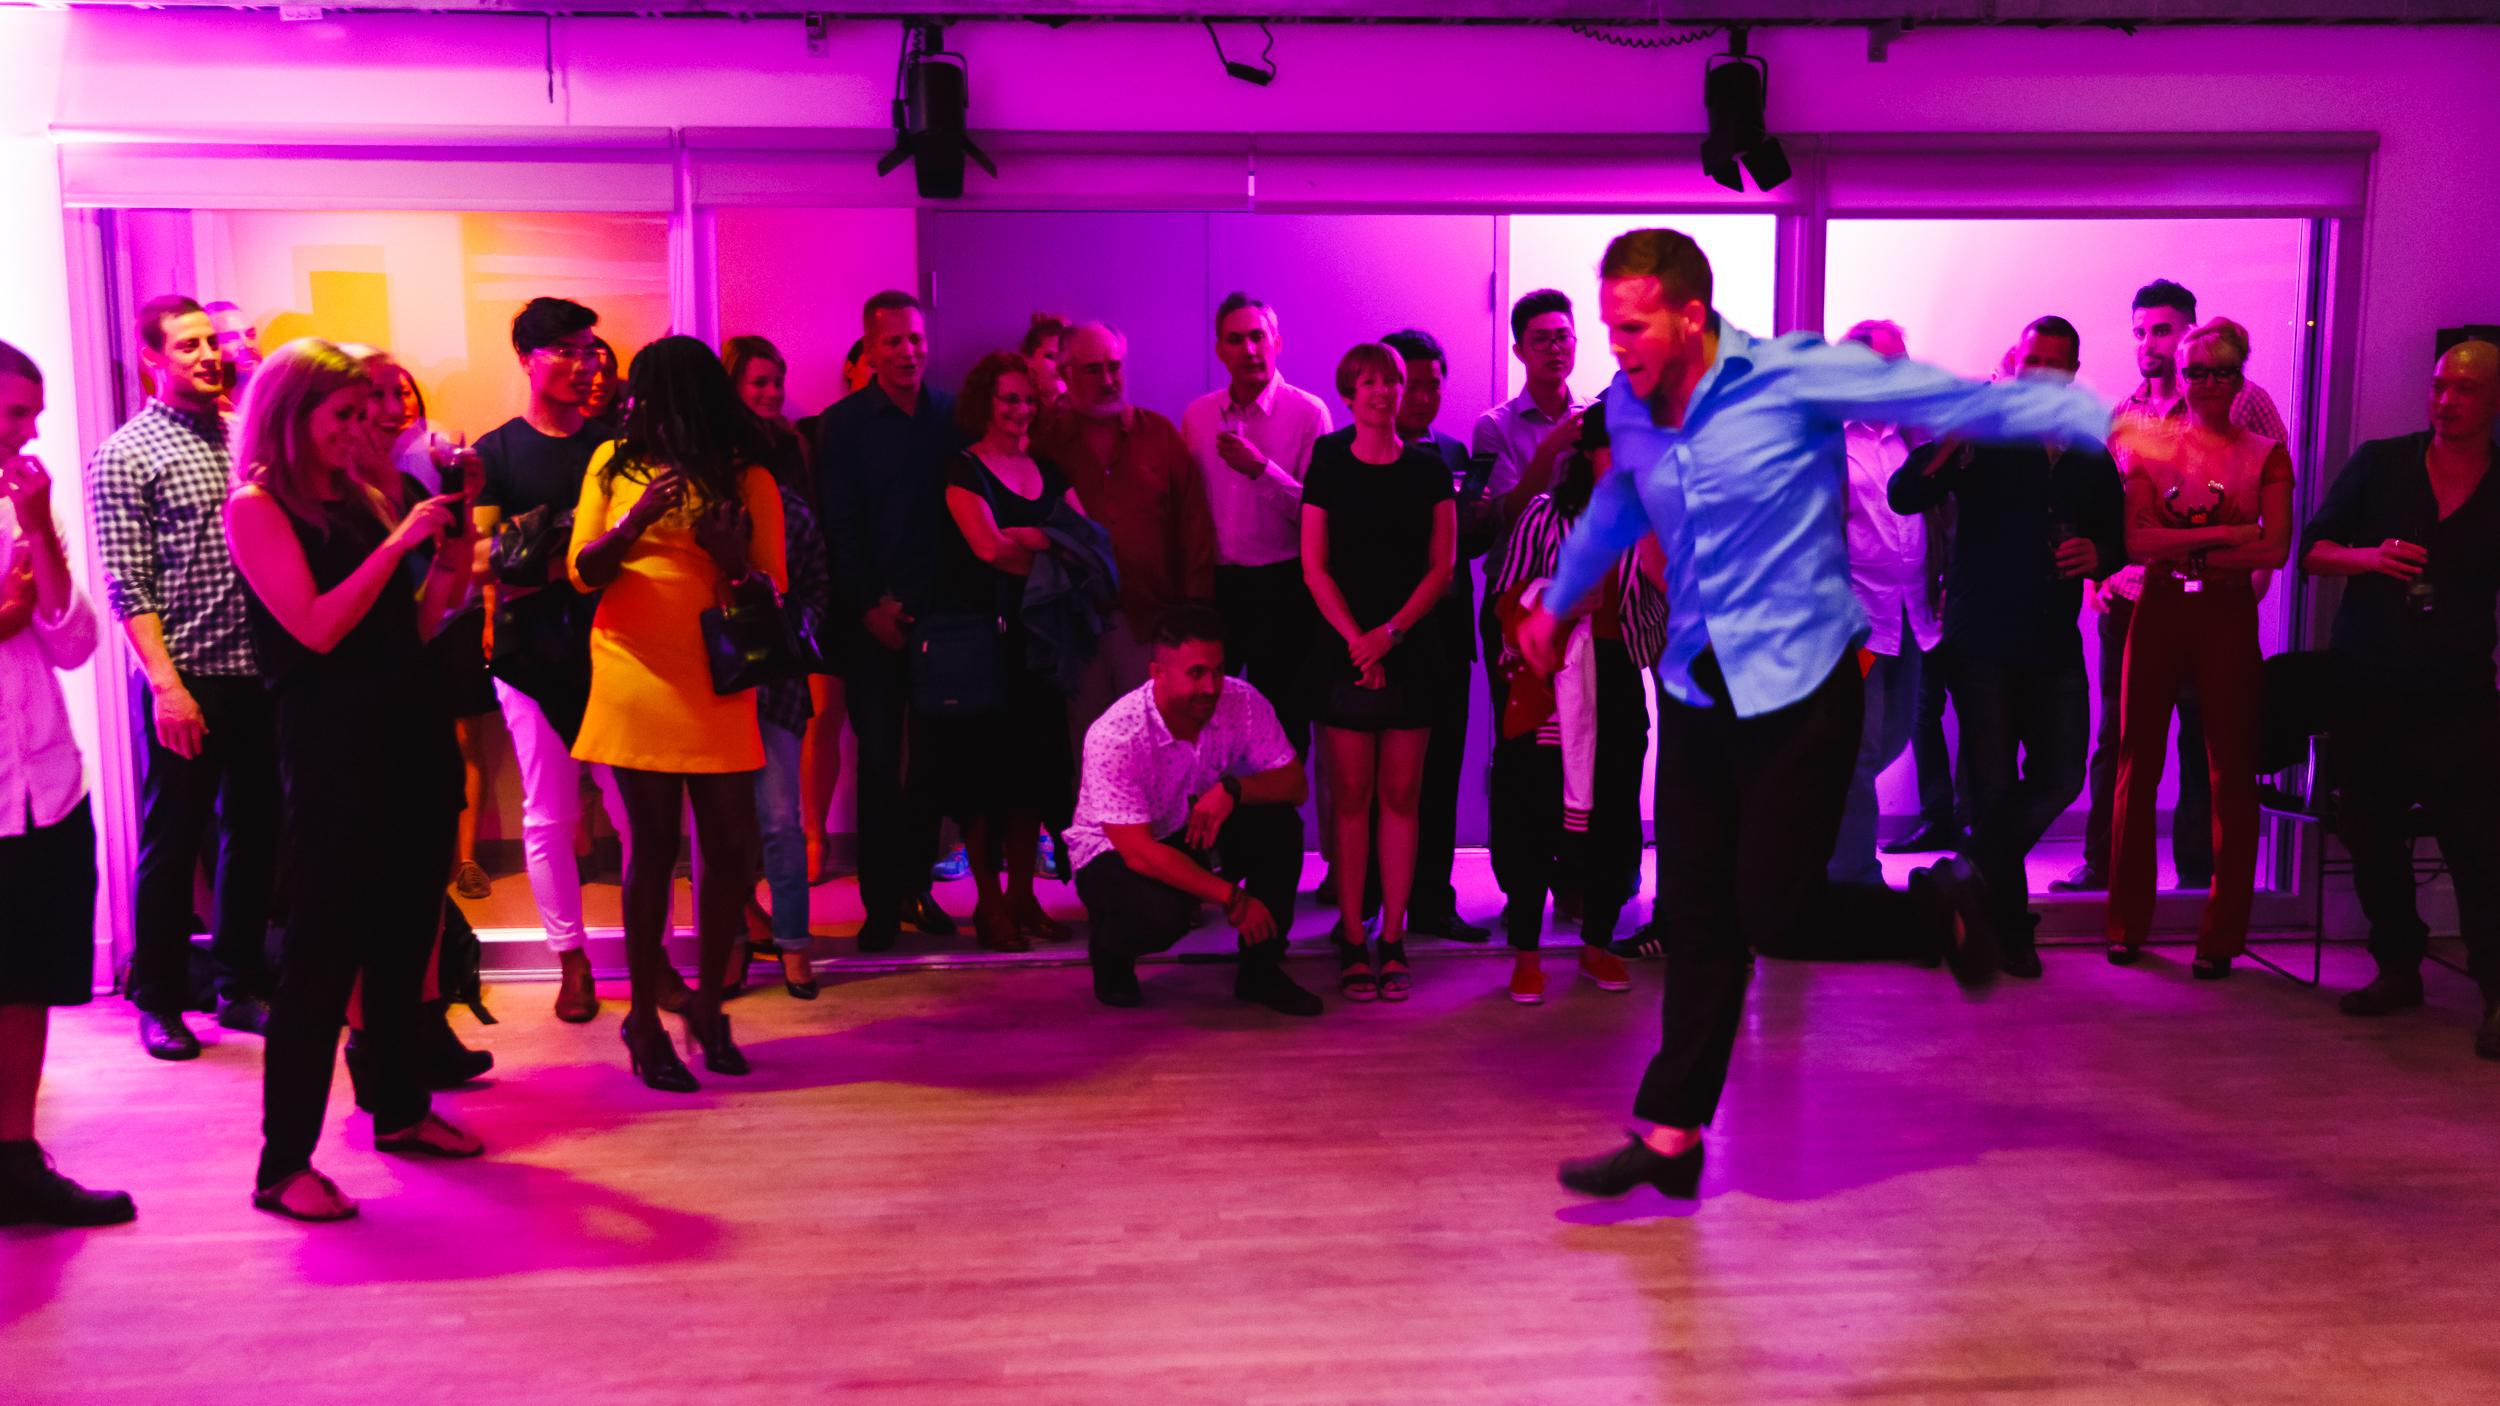 Scotiabank-Dance-Hotel-image22.jpg